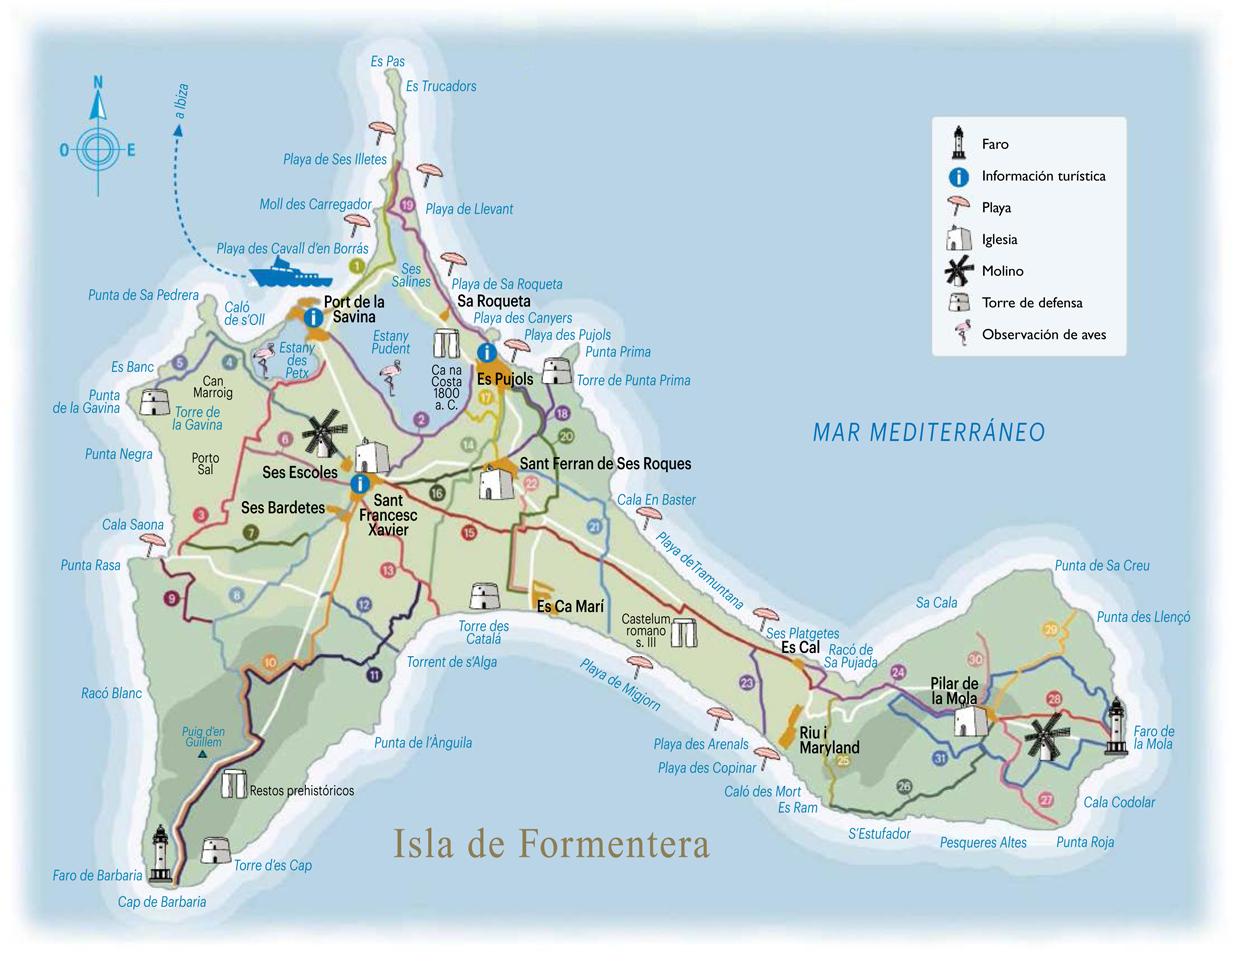 Mapa de rutas de isla de Formentera (click para ampliar). Mapa: Salvador Prior